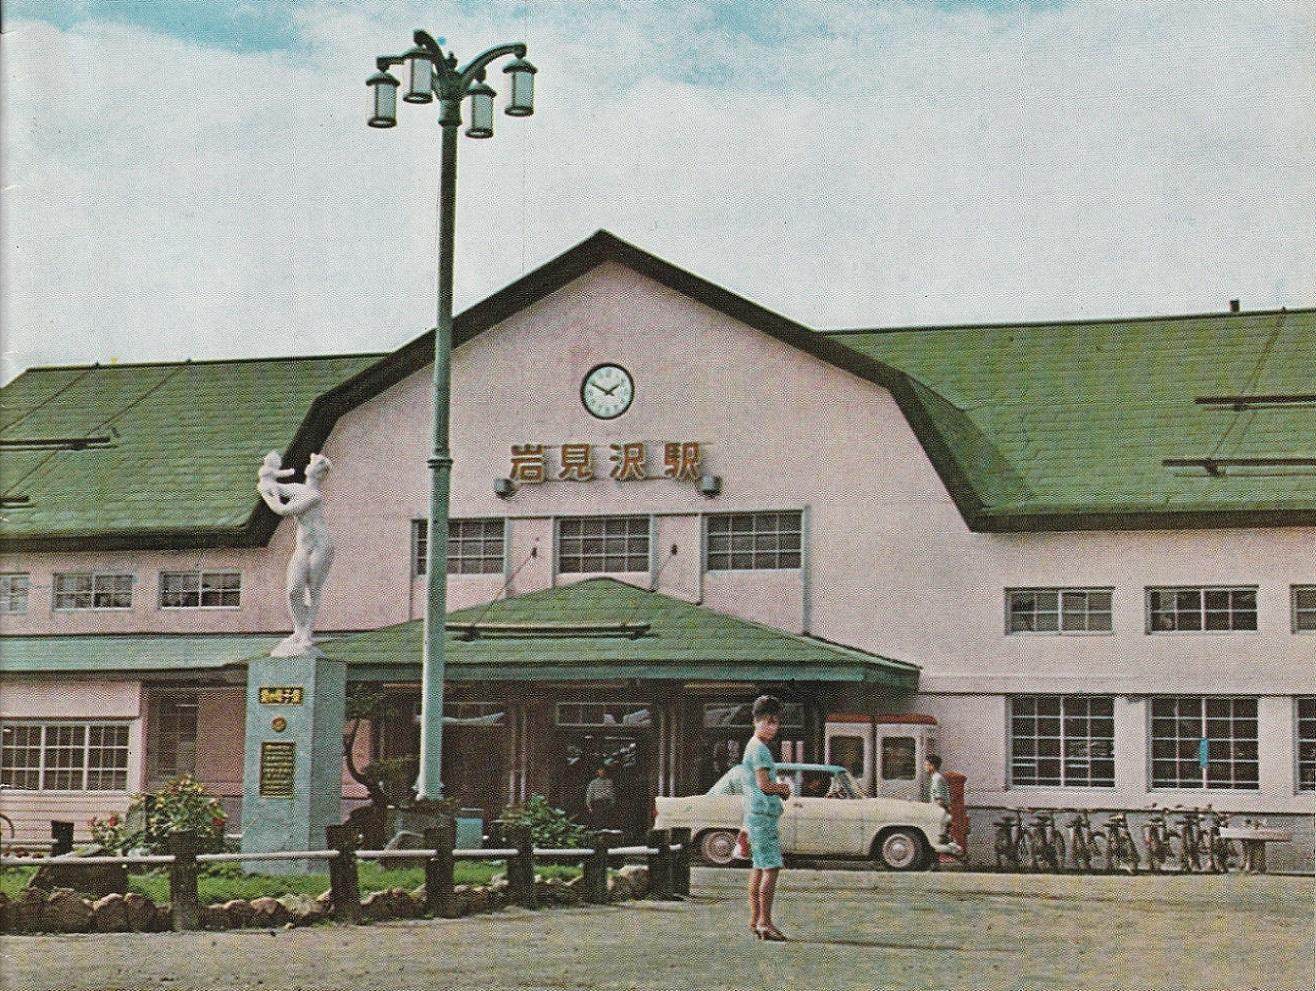 岩見沢駅a04